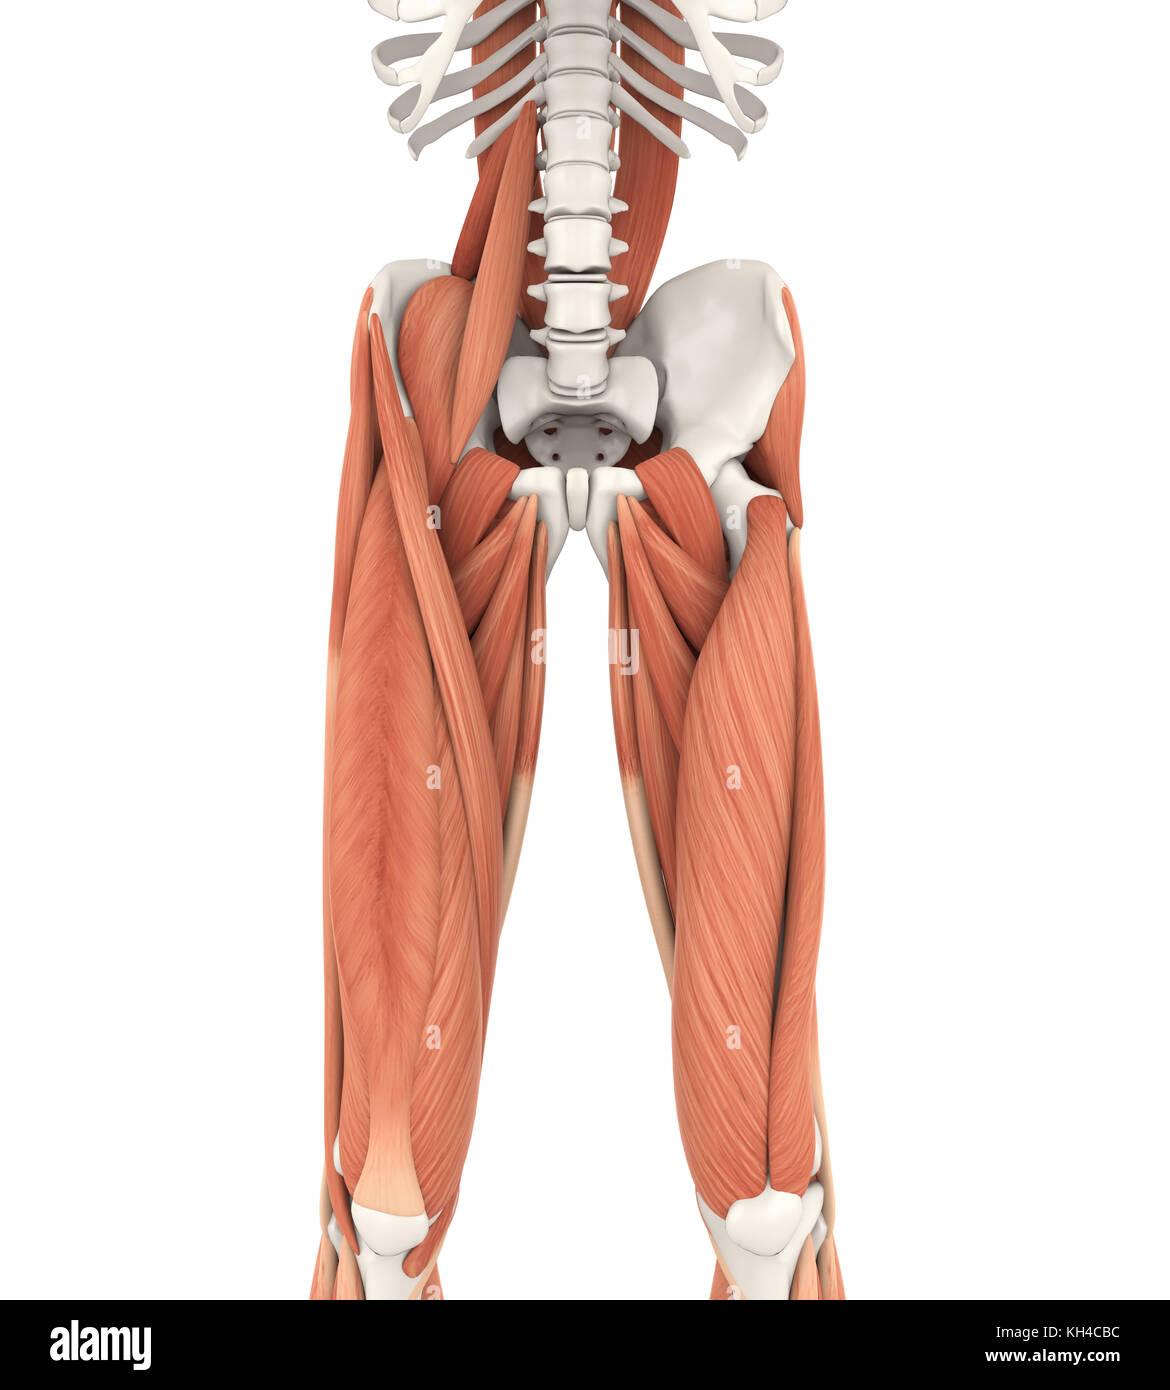 Quadriceps Imágenes De Stock & Quadriceps Fotos De Stock - Alamy